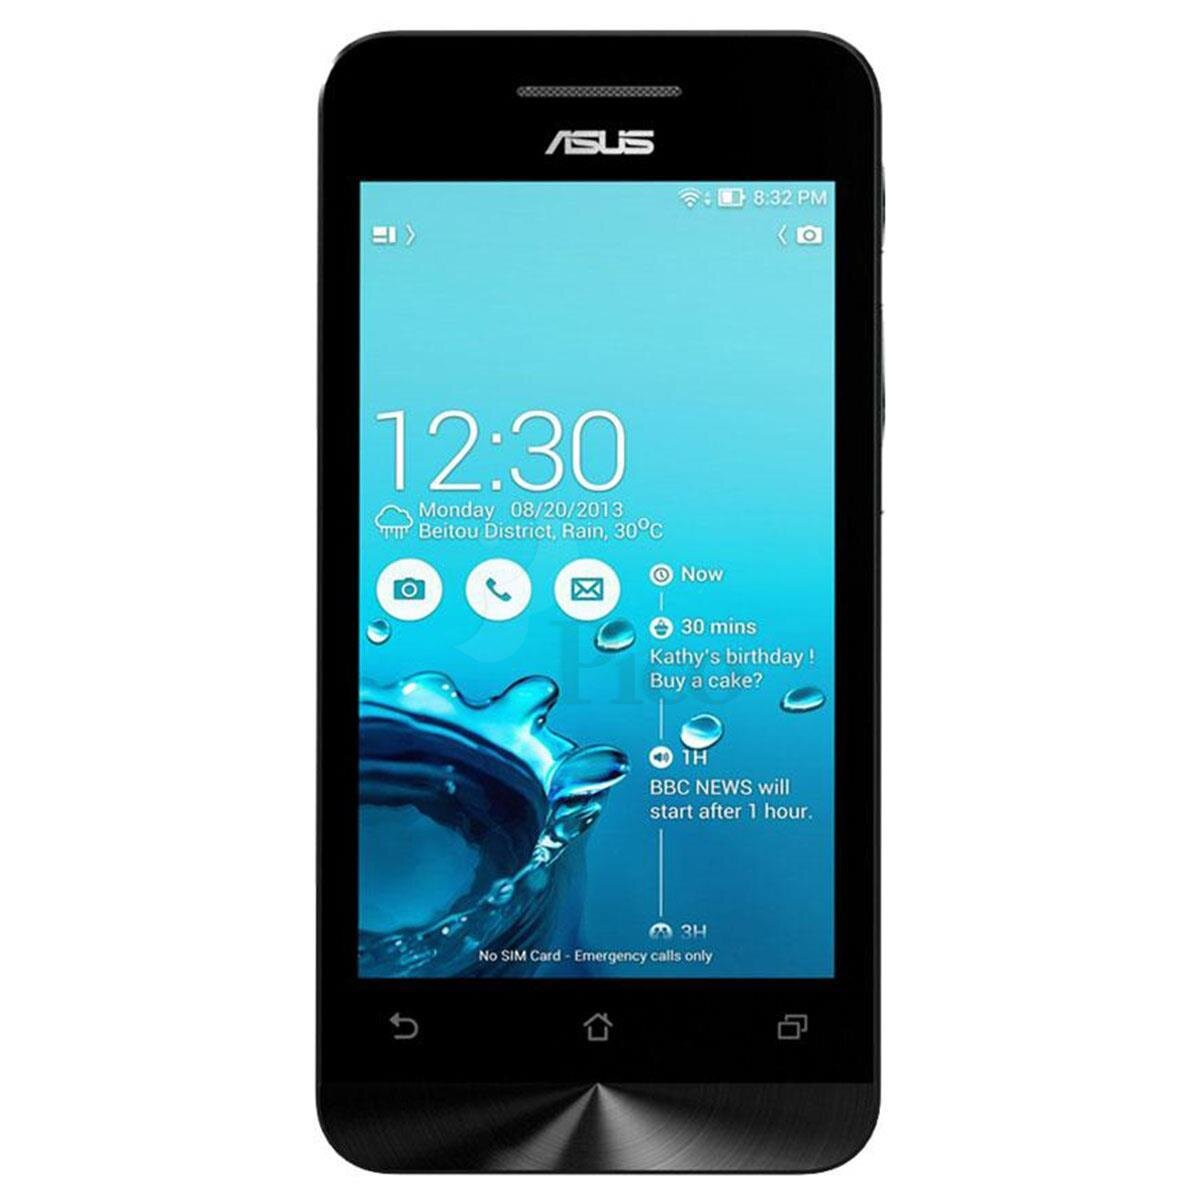 Điện thoại Asus Zenfone 4 A400CG - 2 sim